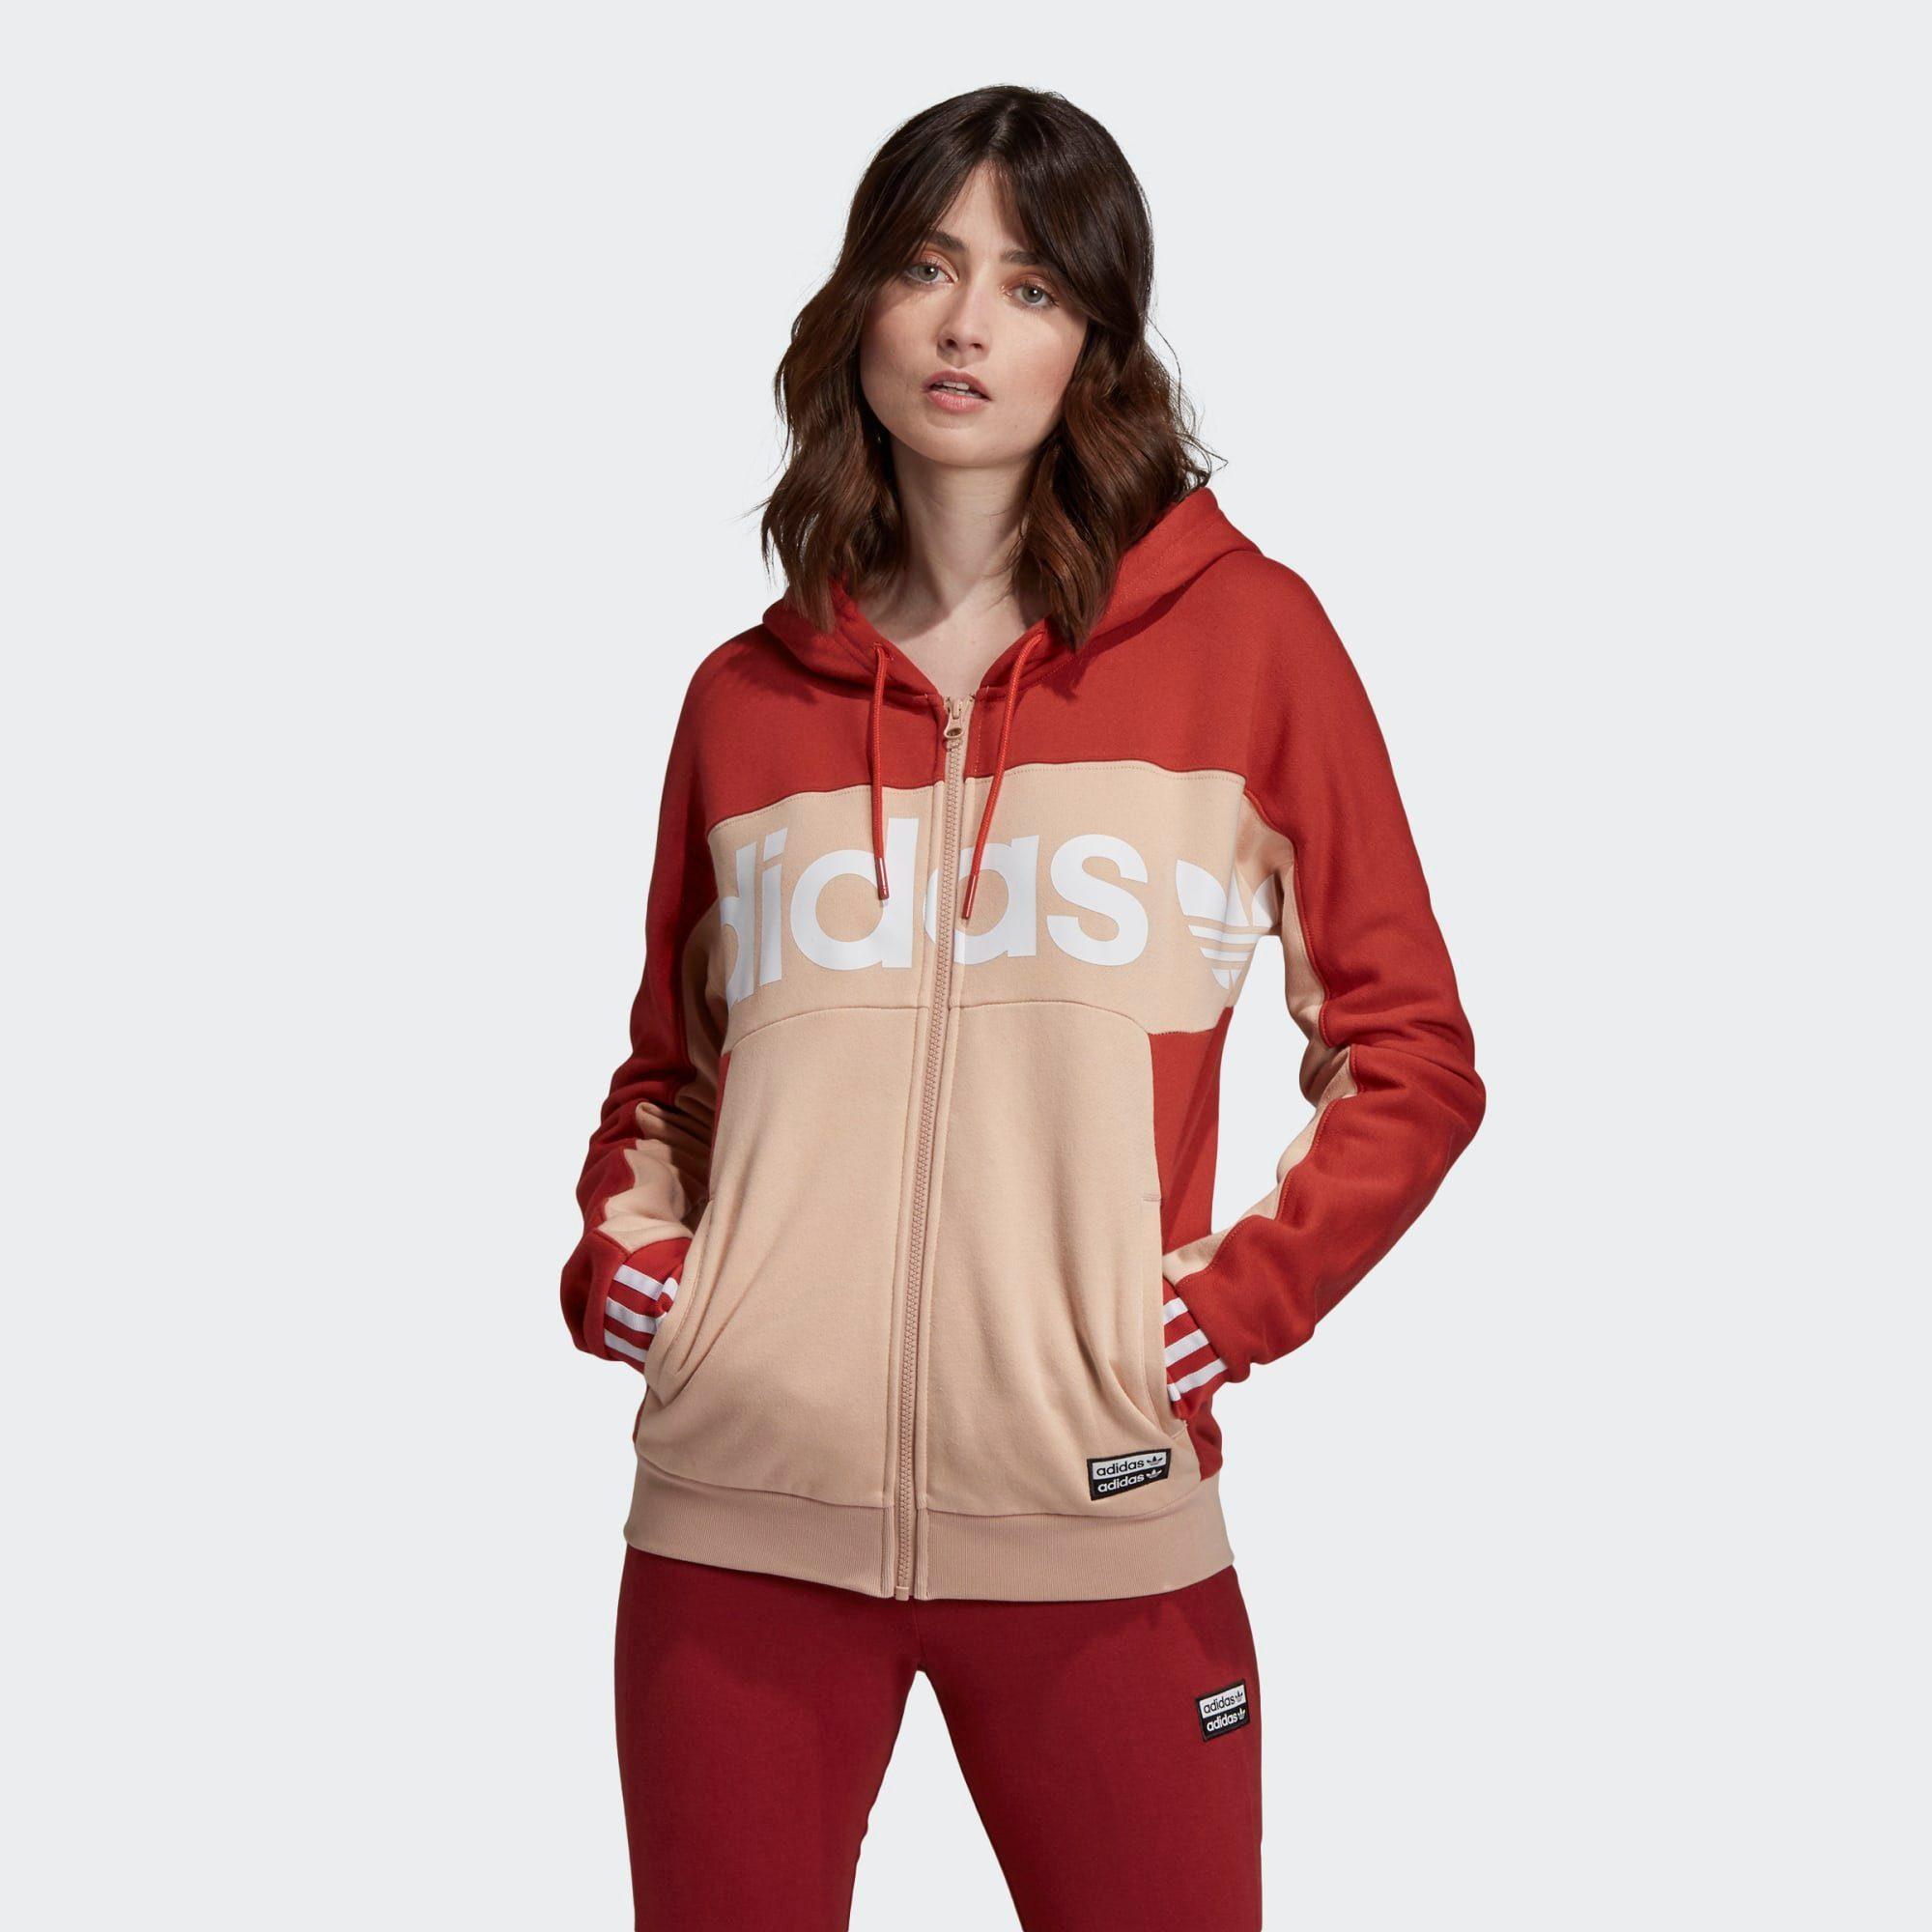 Adidas Originals Sweatjacke »hooded Track Top« Ryv